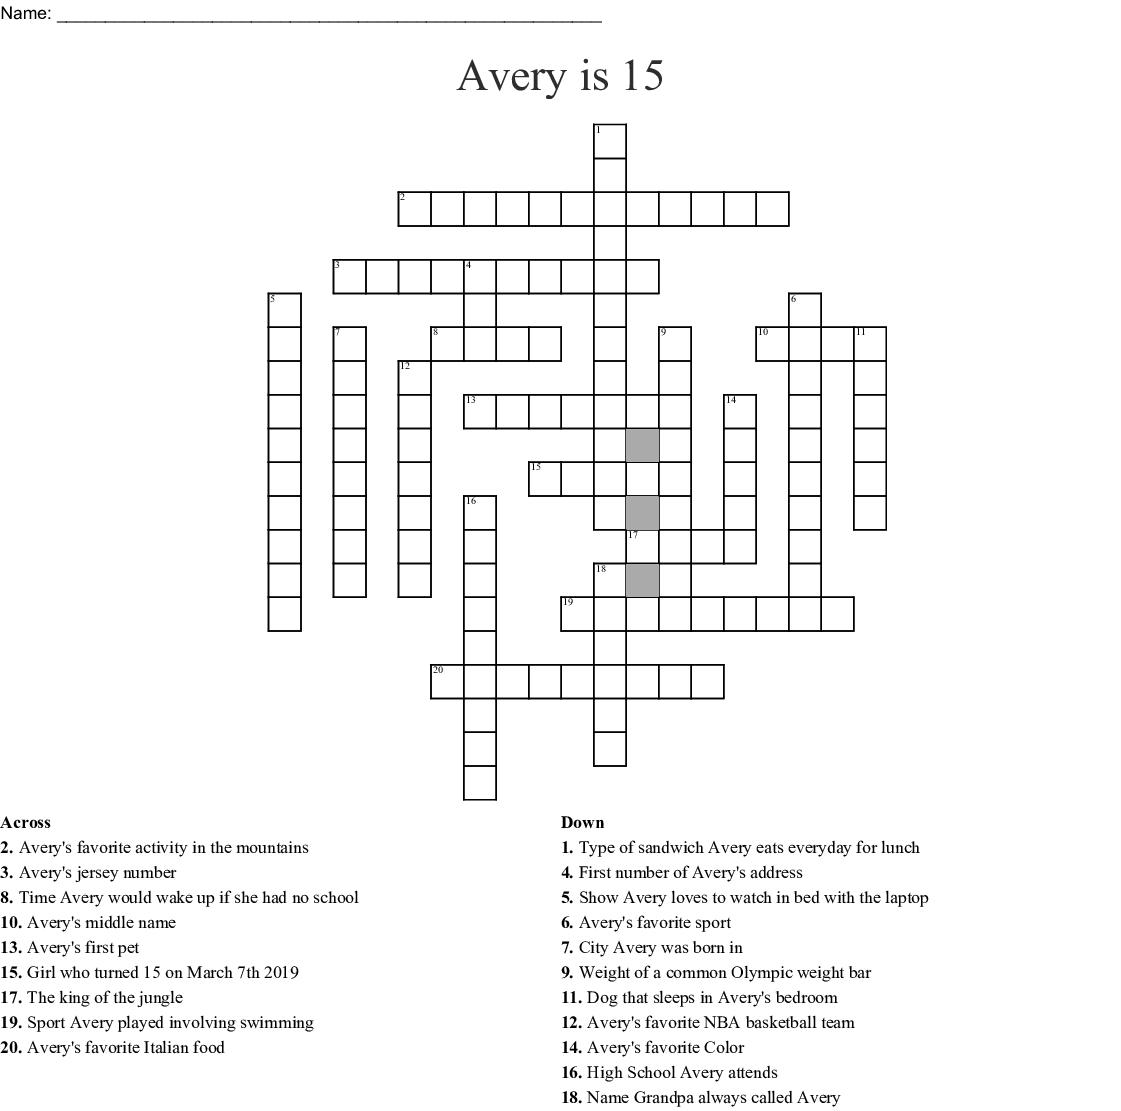 Avery Is 15 Crossword